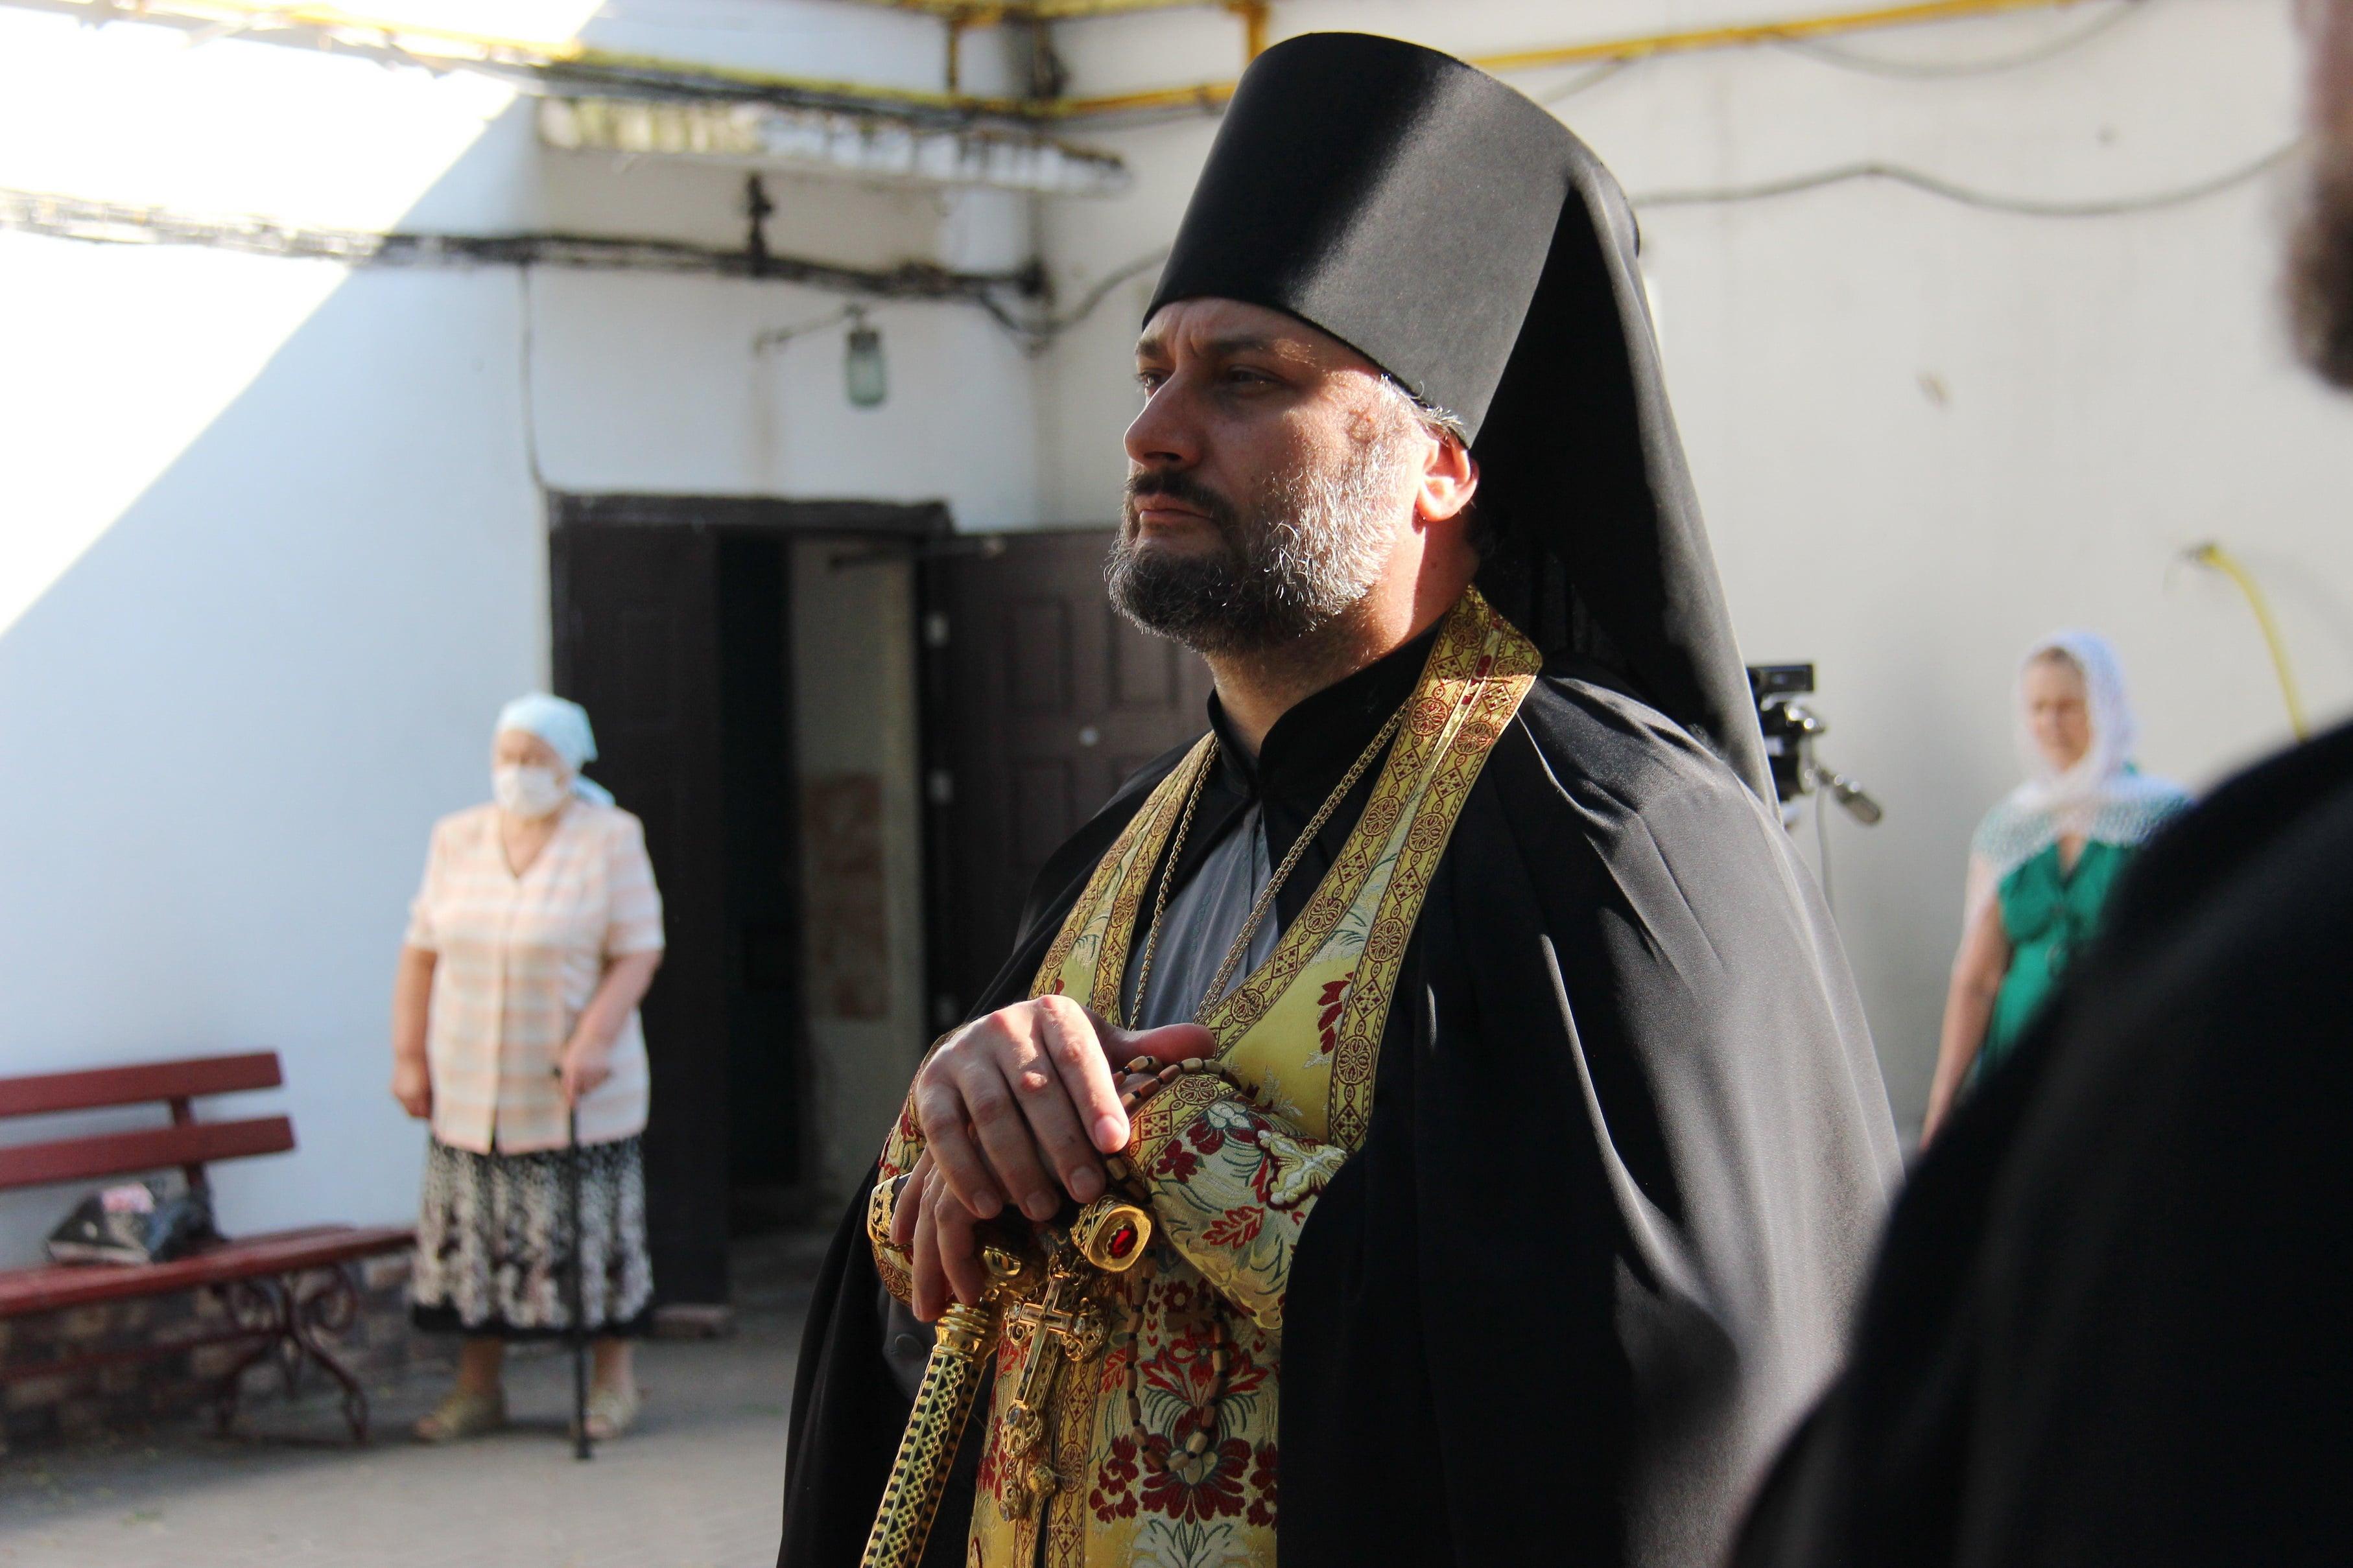 http://monuspen.ru/photoreports/767755fb4521ea66ecbf1338743fc8di.JPG